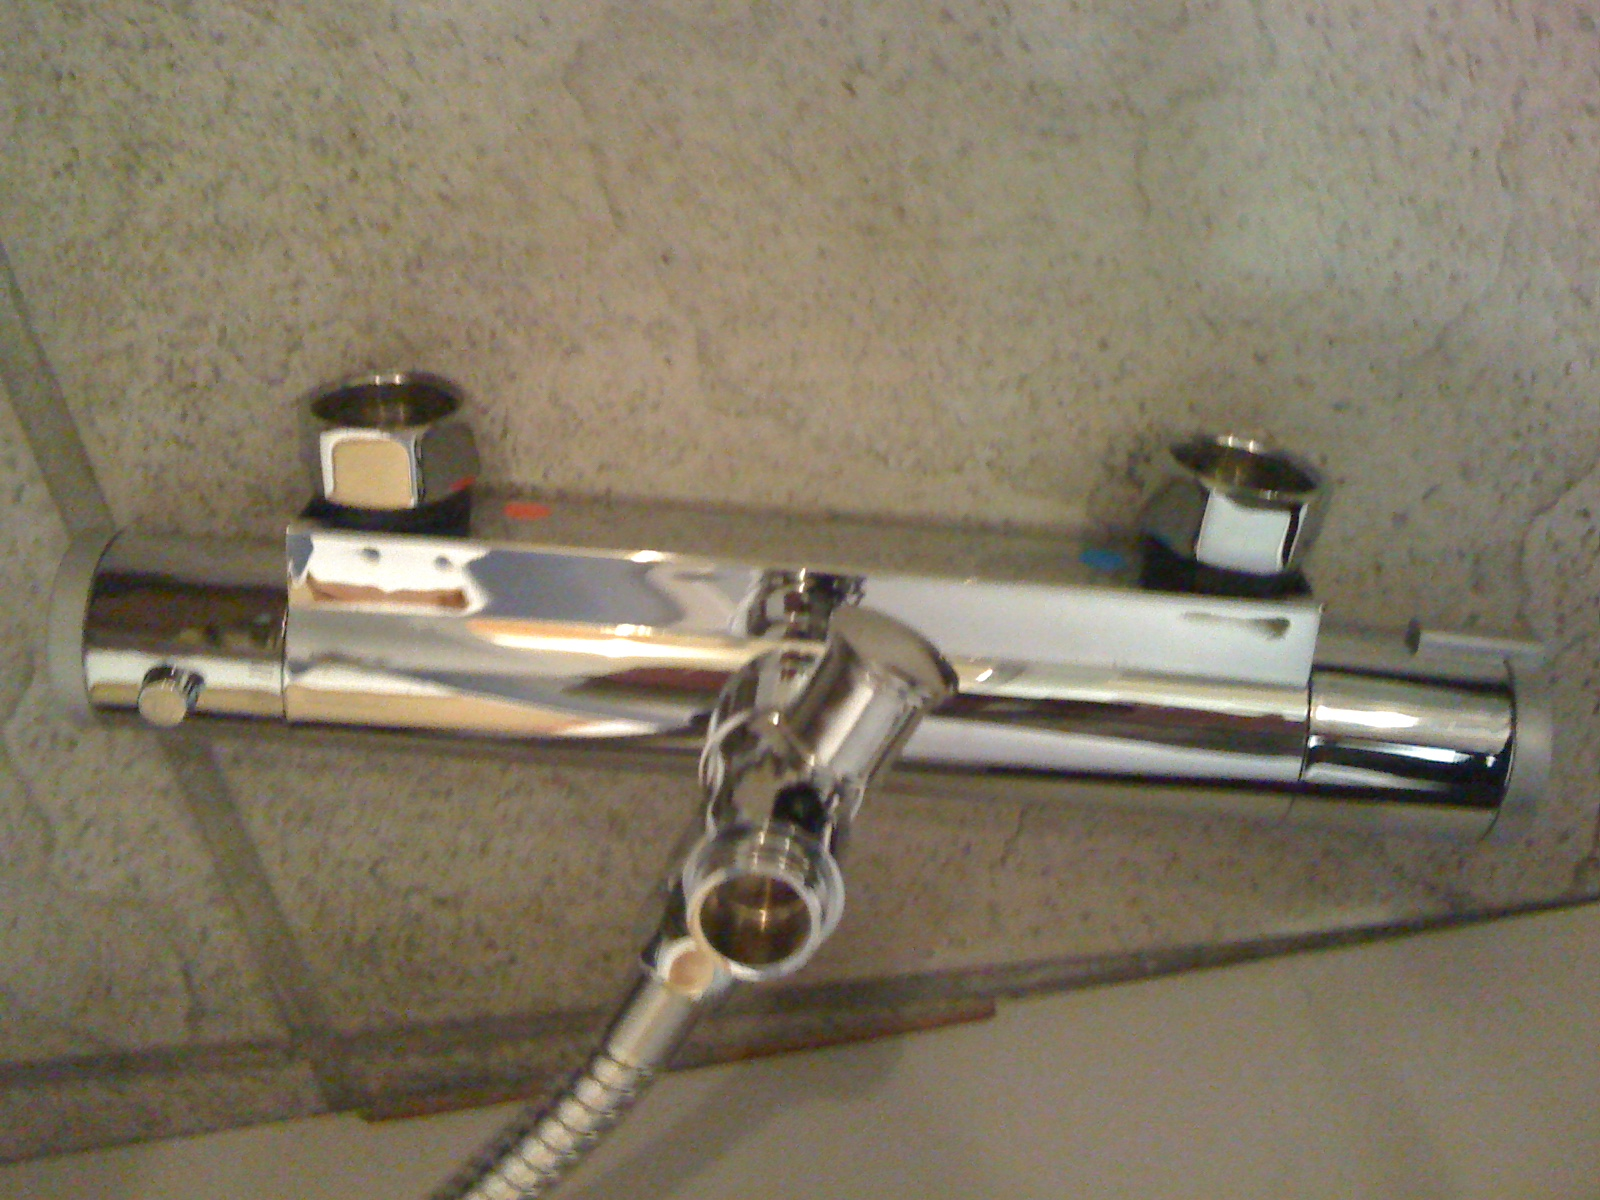 Raccord mitigeur aux tuyaux